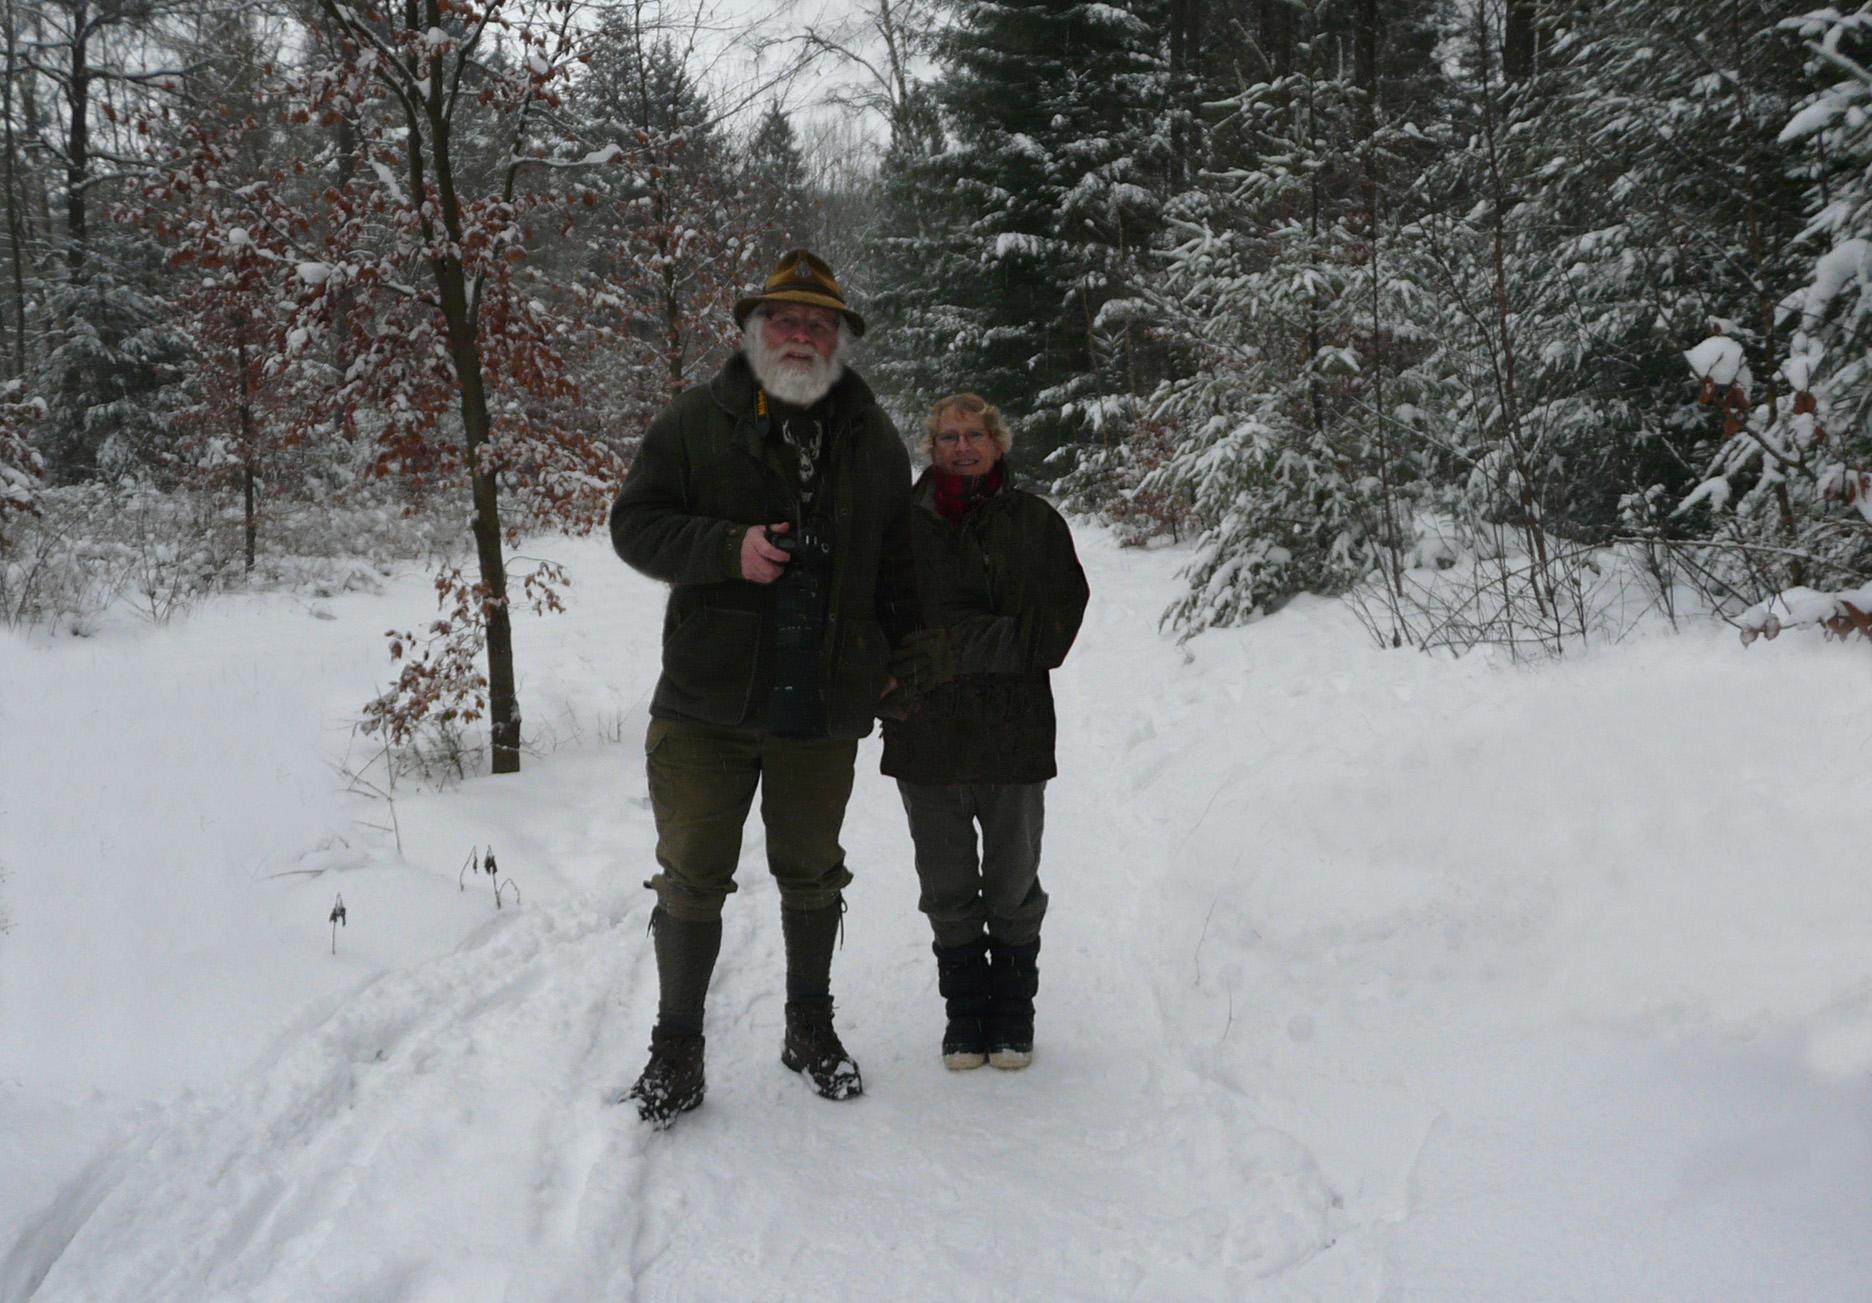 Samen met Fransien in het besneeuwde bos op de Veluwe – Foto: ©Arnoud Verwoert